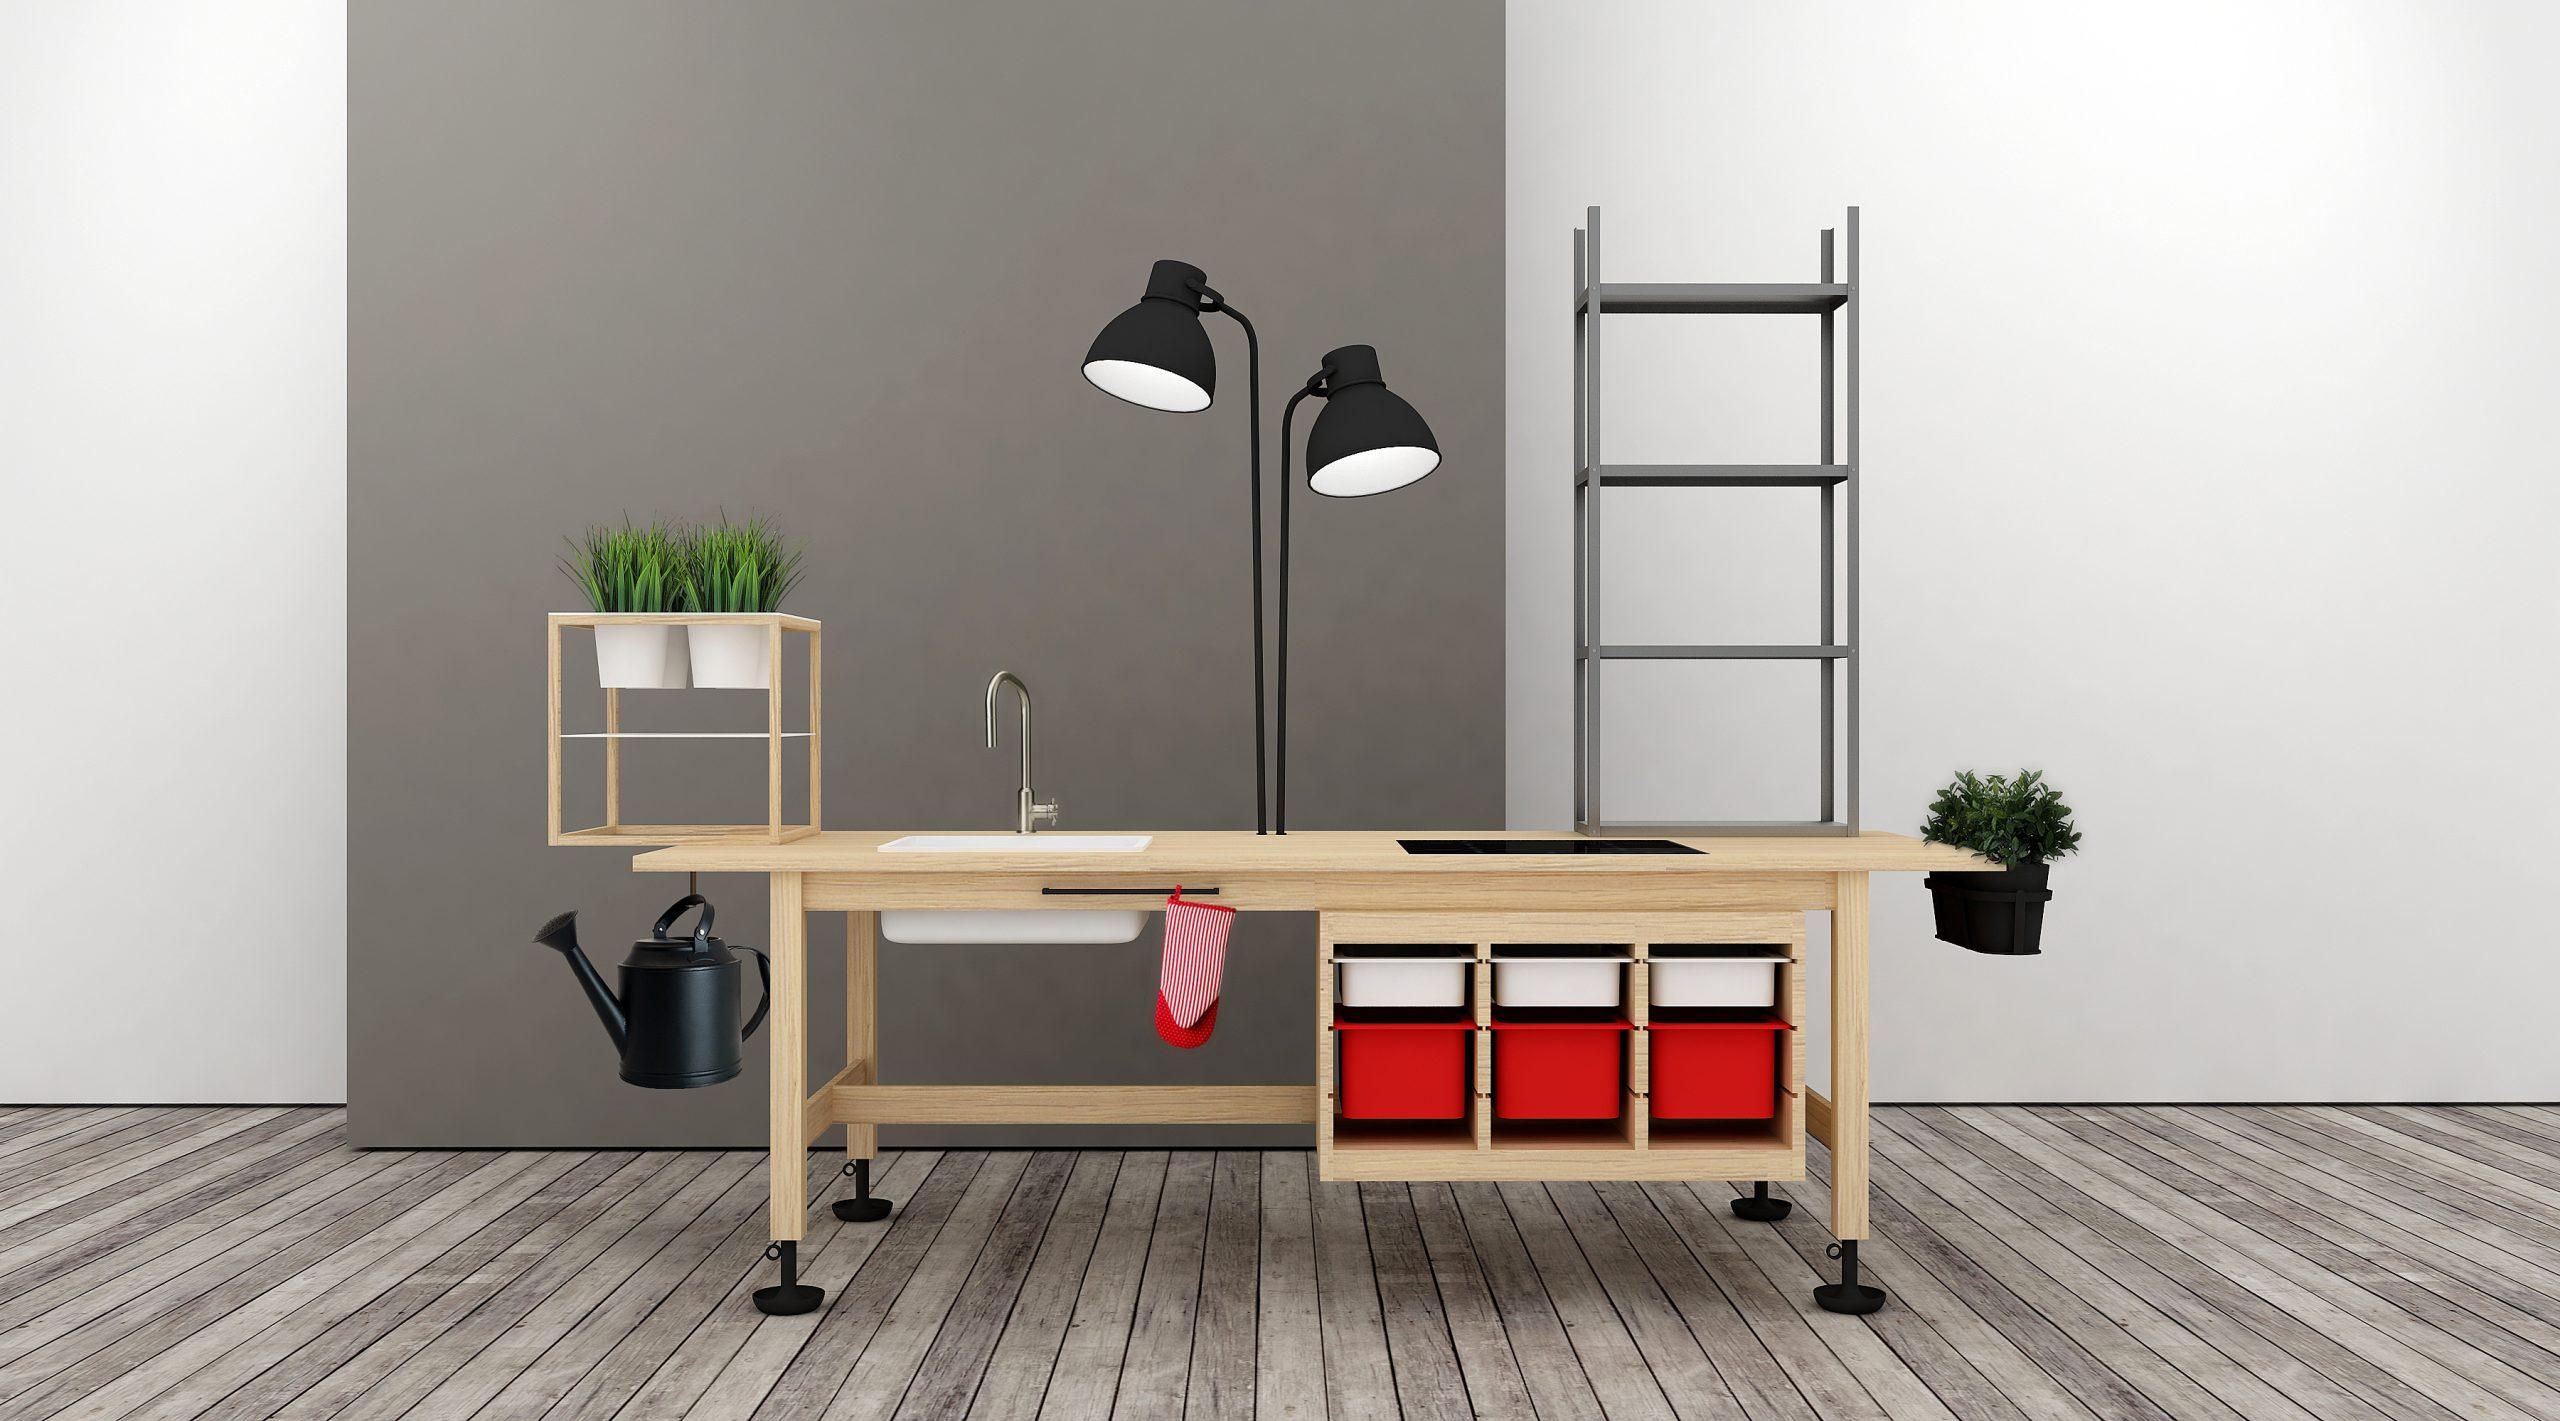 Design District Zagreb Calls Designers & DIYersto Hack IKEA's Products